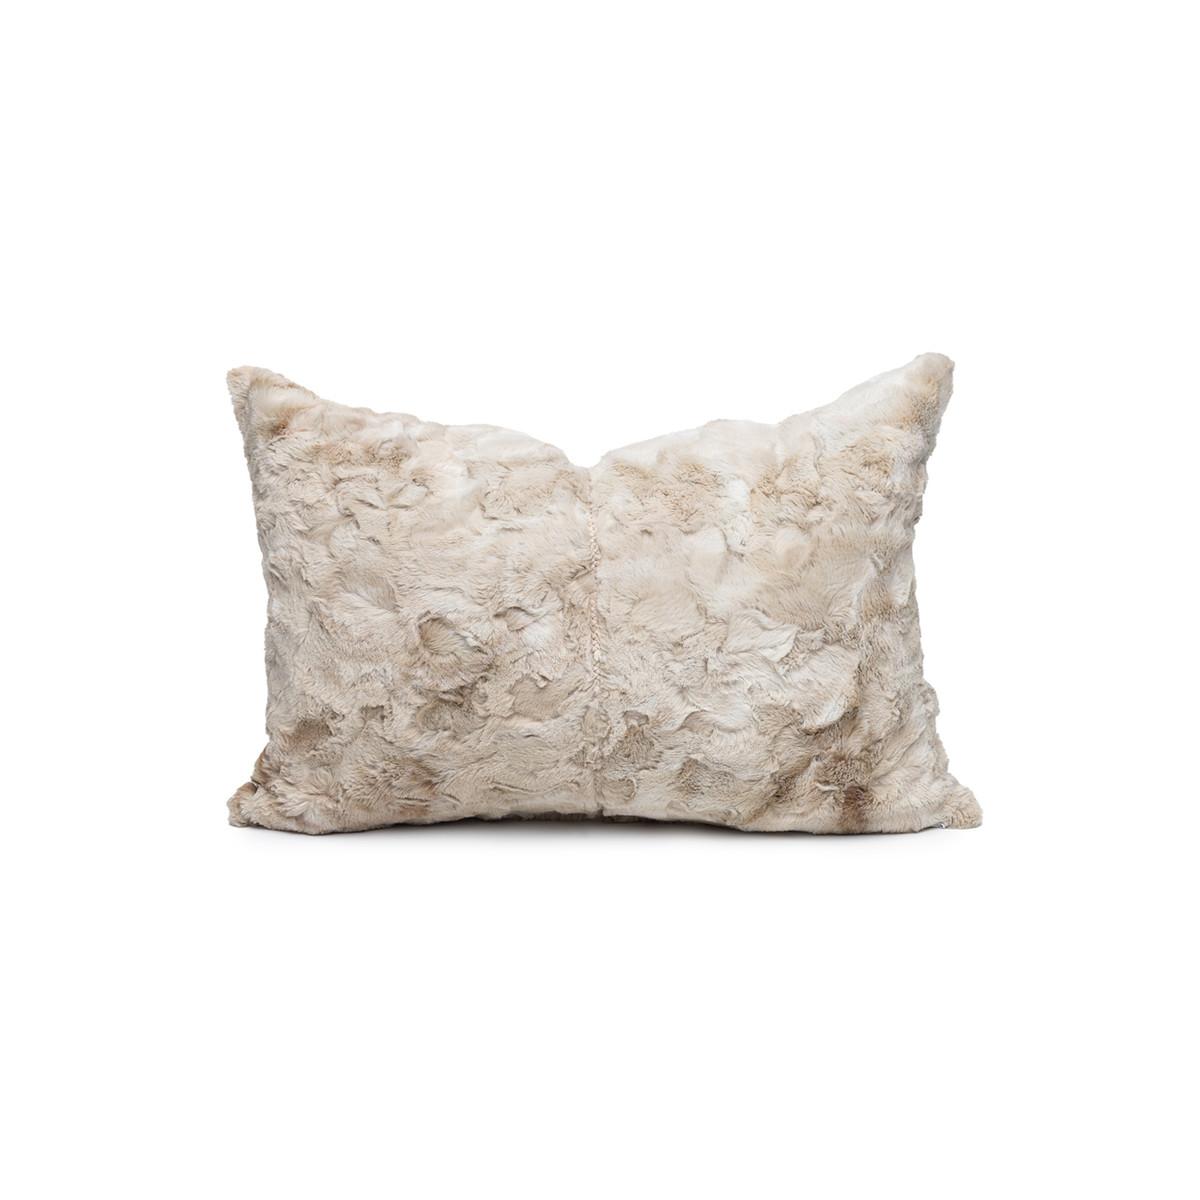 Sugar Vegan Tan Faux Fur Washable Pillow - Front